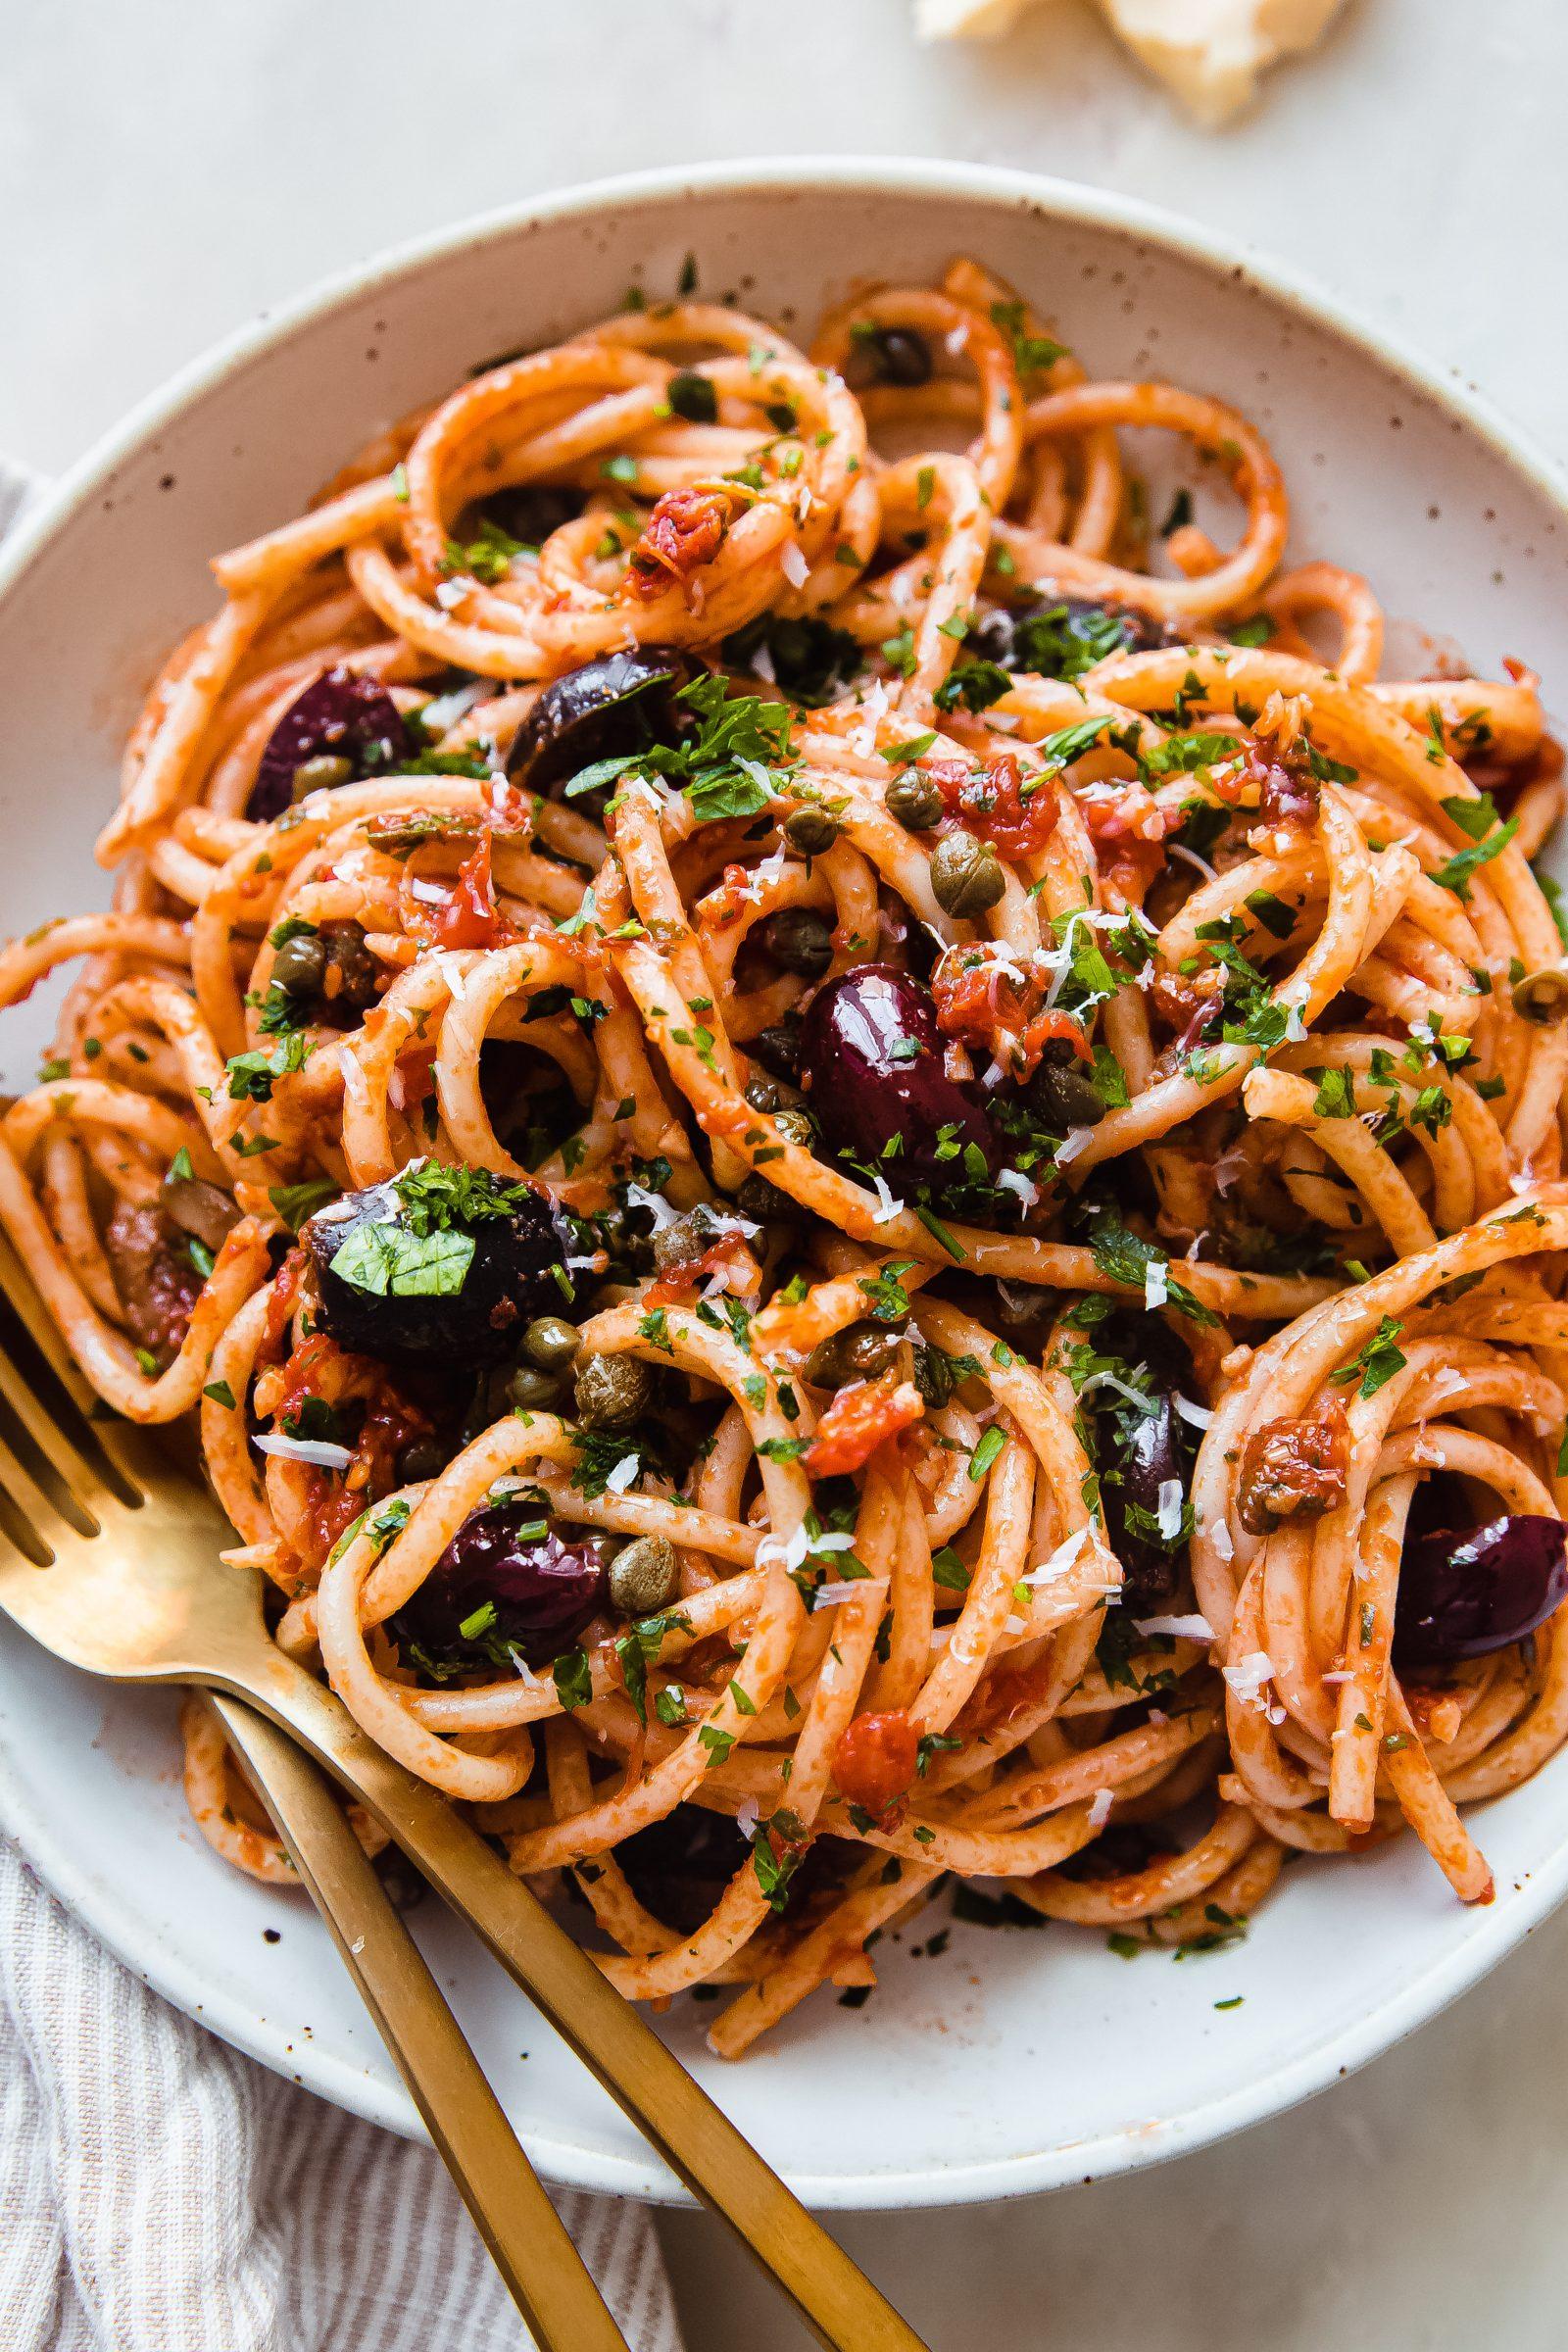 pasta puttanesca in speckled plate